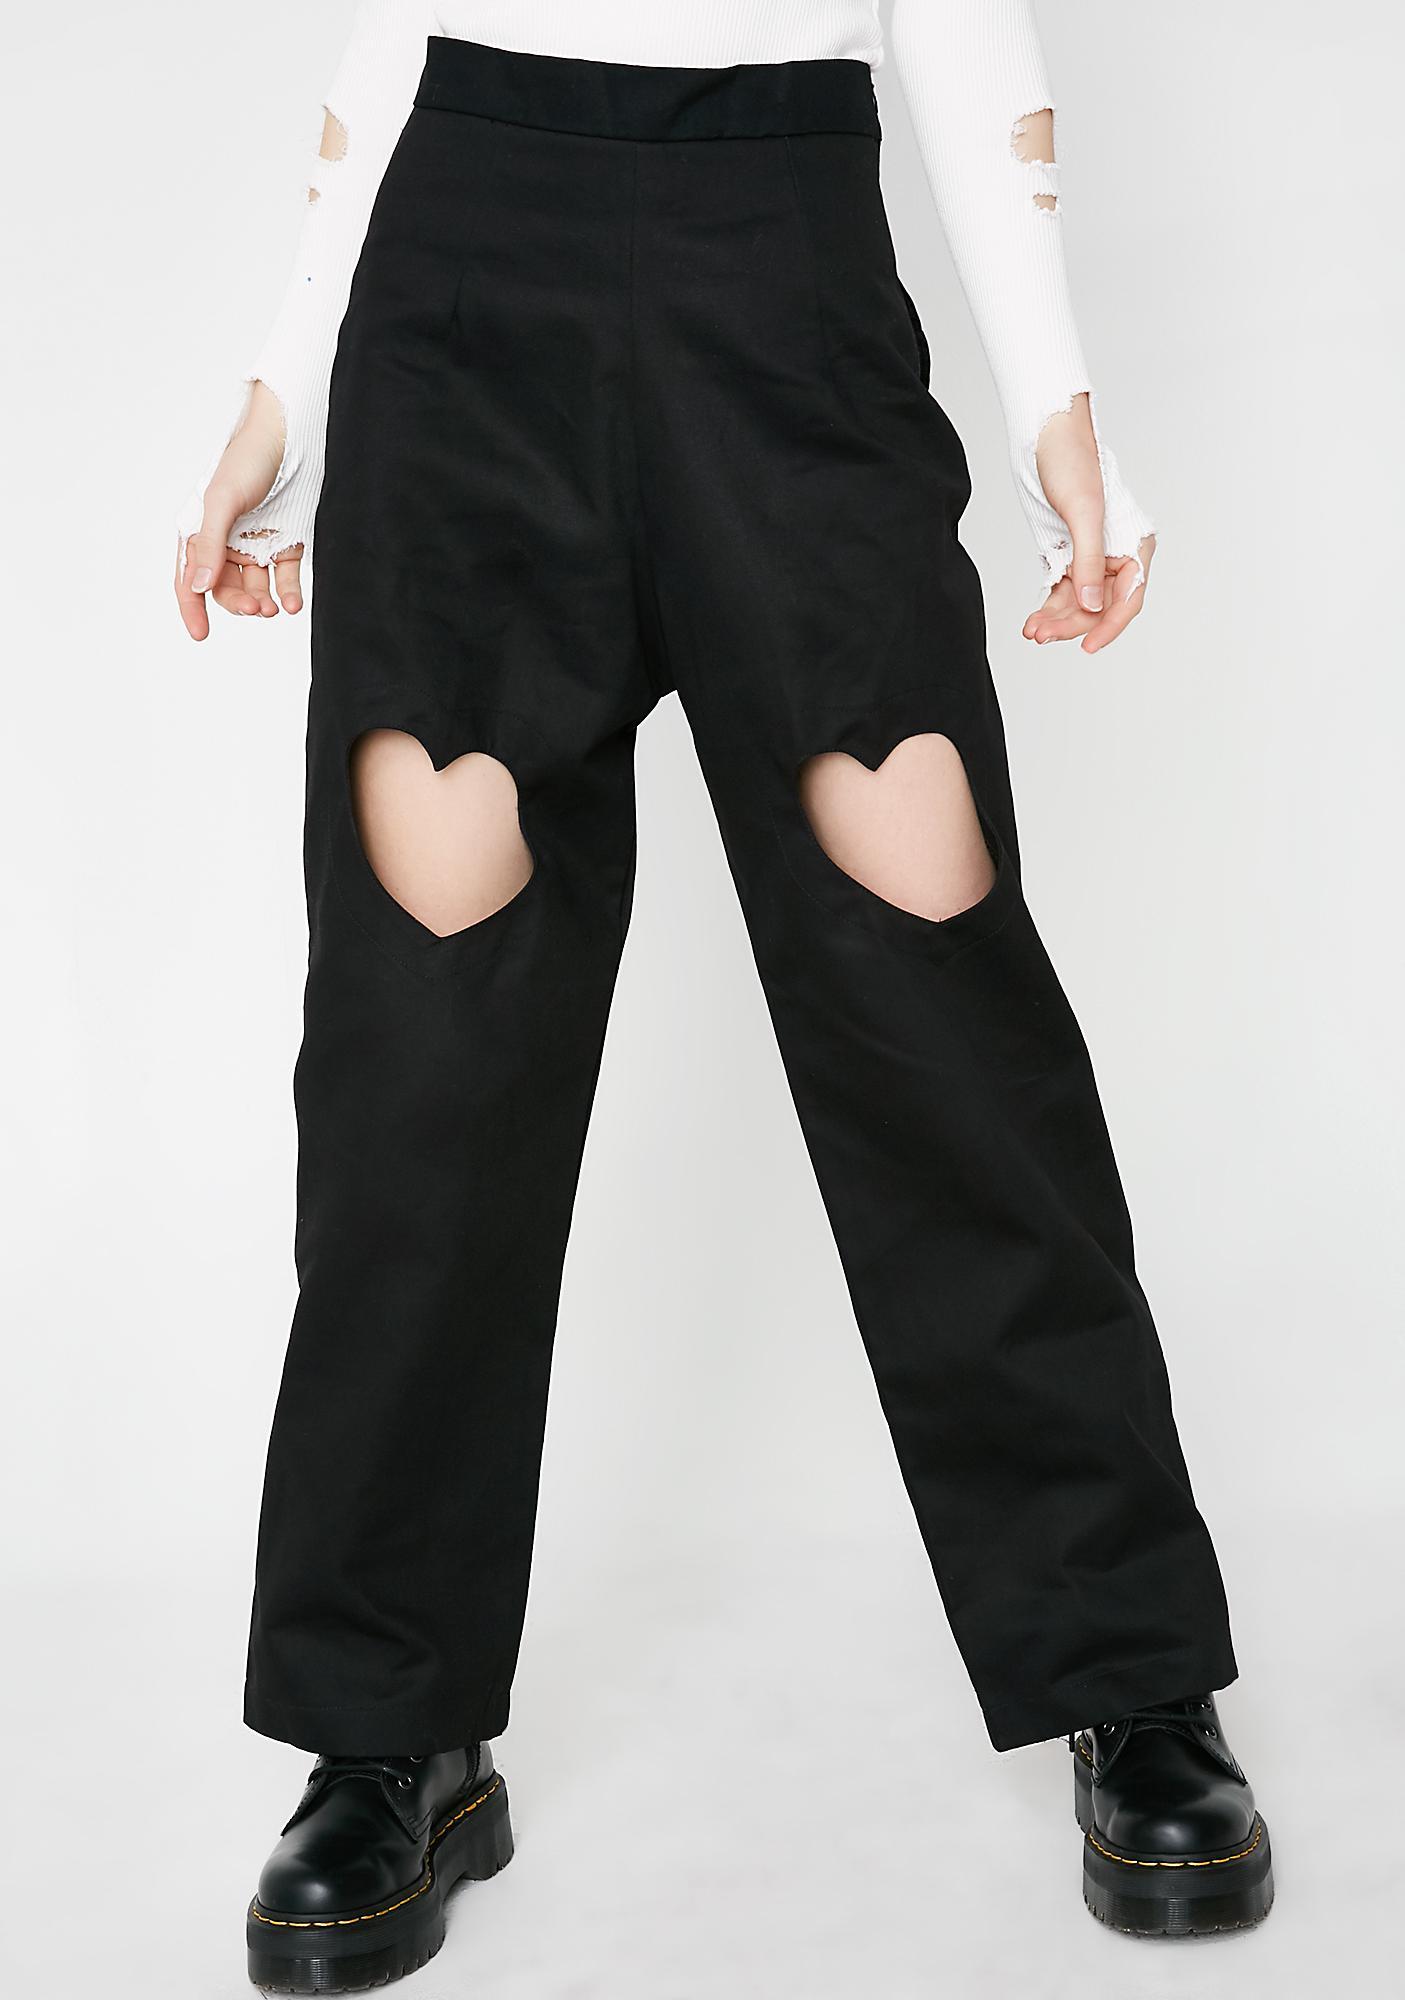 Morph8ne Love One Another Pants